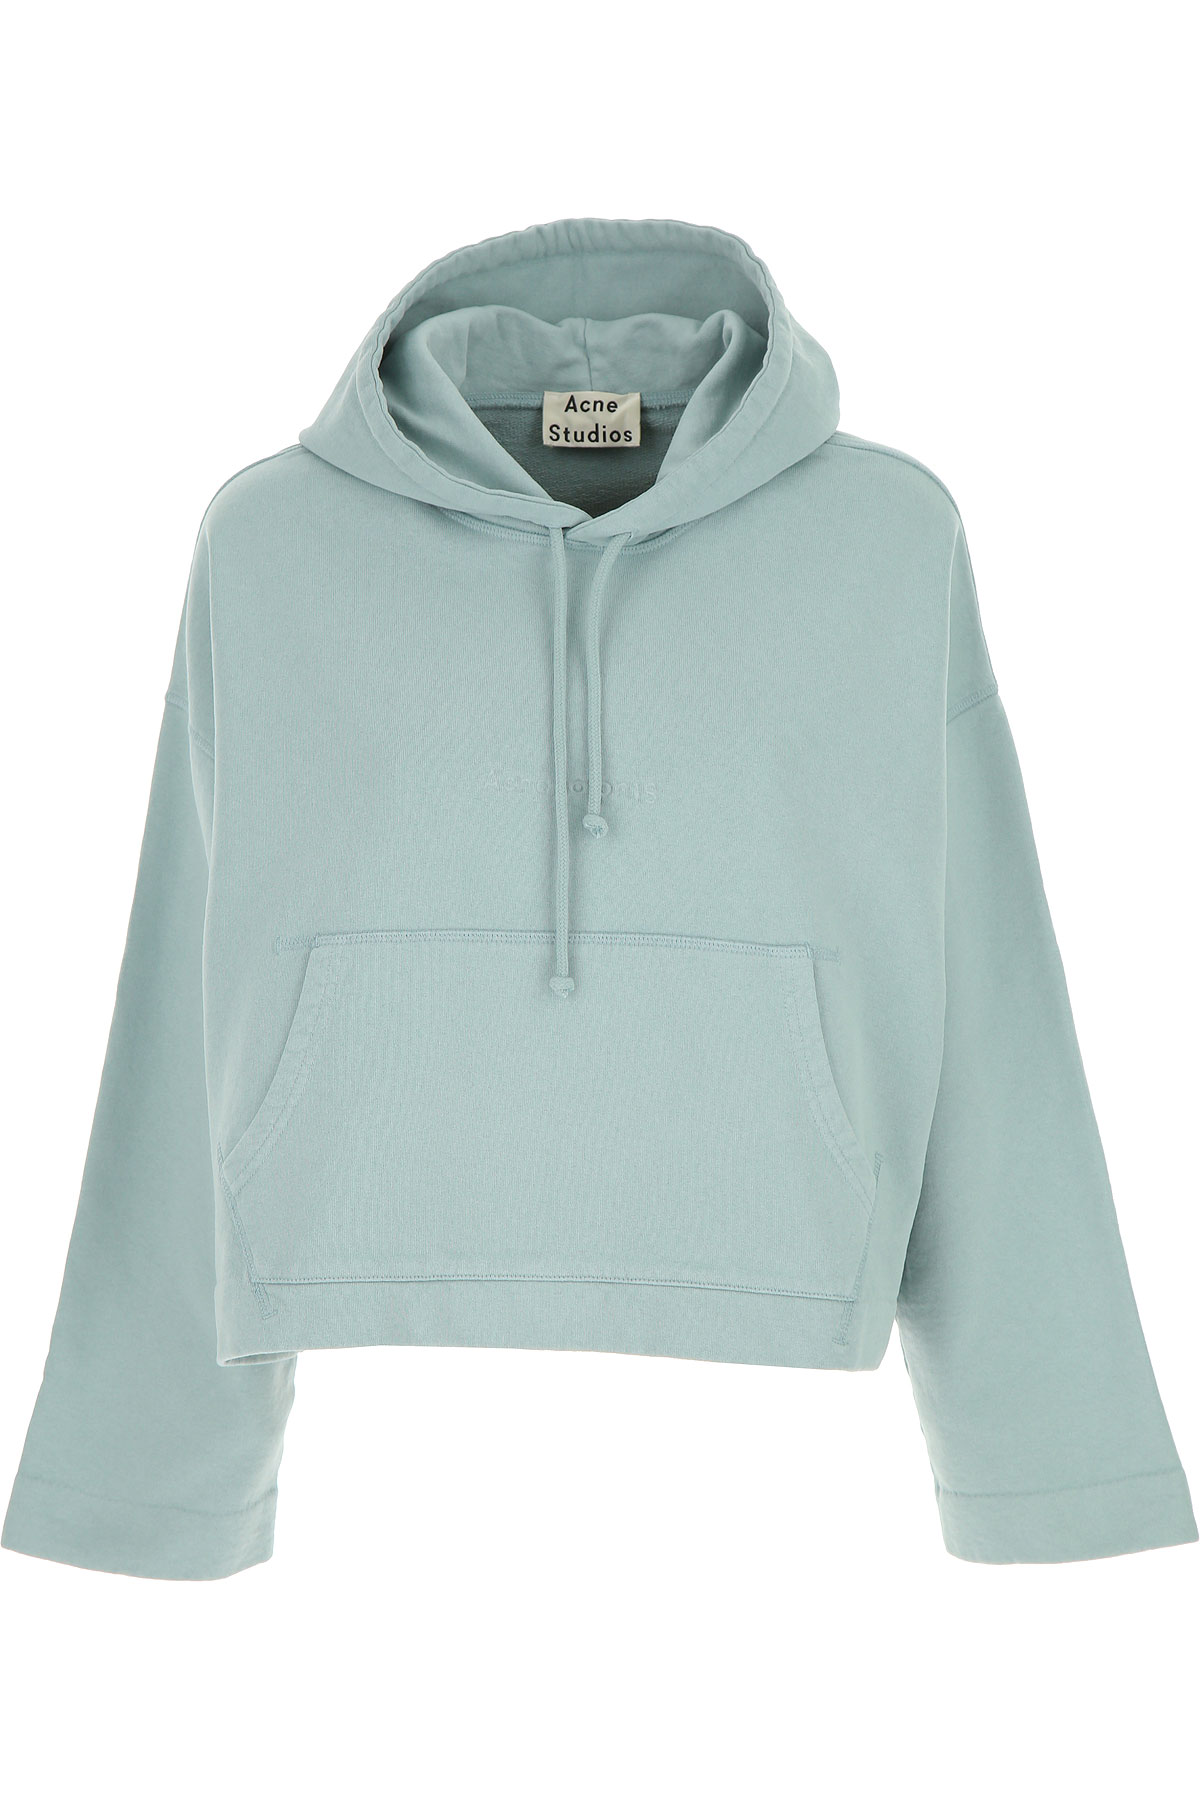 Acne Studios Sweatshirt for Women, Light Blue, Cotton, 2017, 4 6